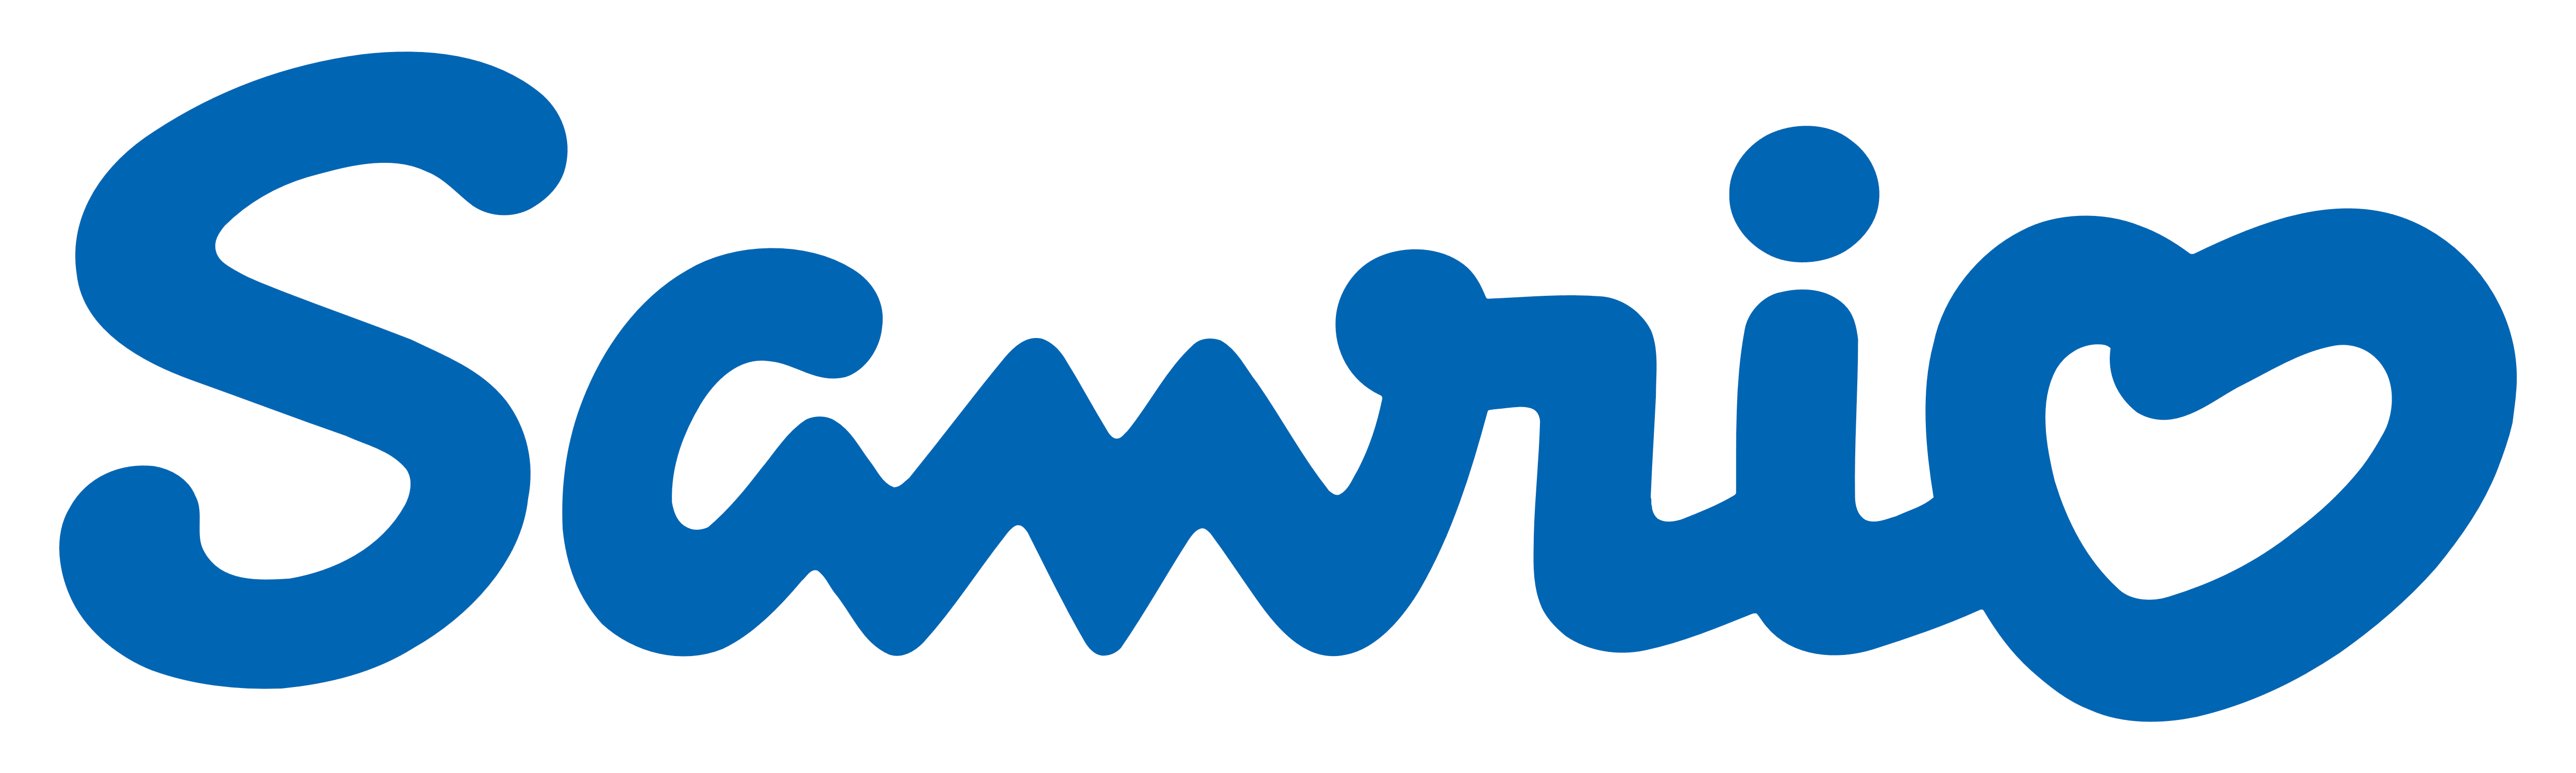 sanrio logos download detroit diesel logo history detroit diesel login